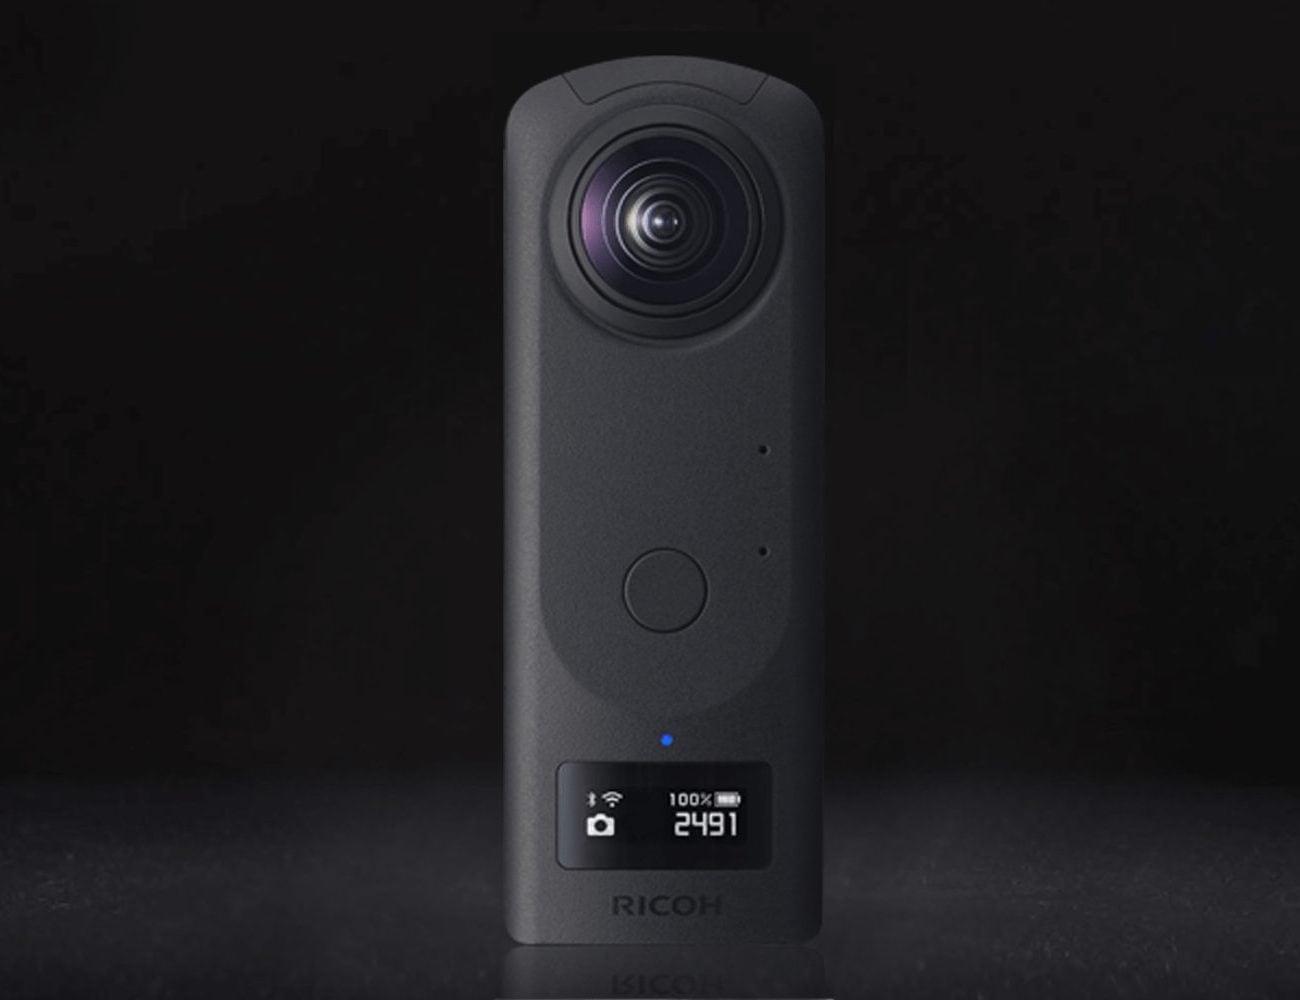 Ricoh Theta Z1 Handheld 360 Camera captures 7K stills